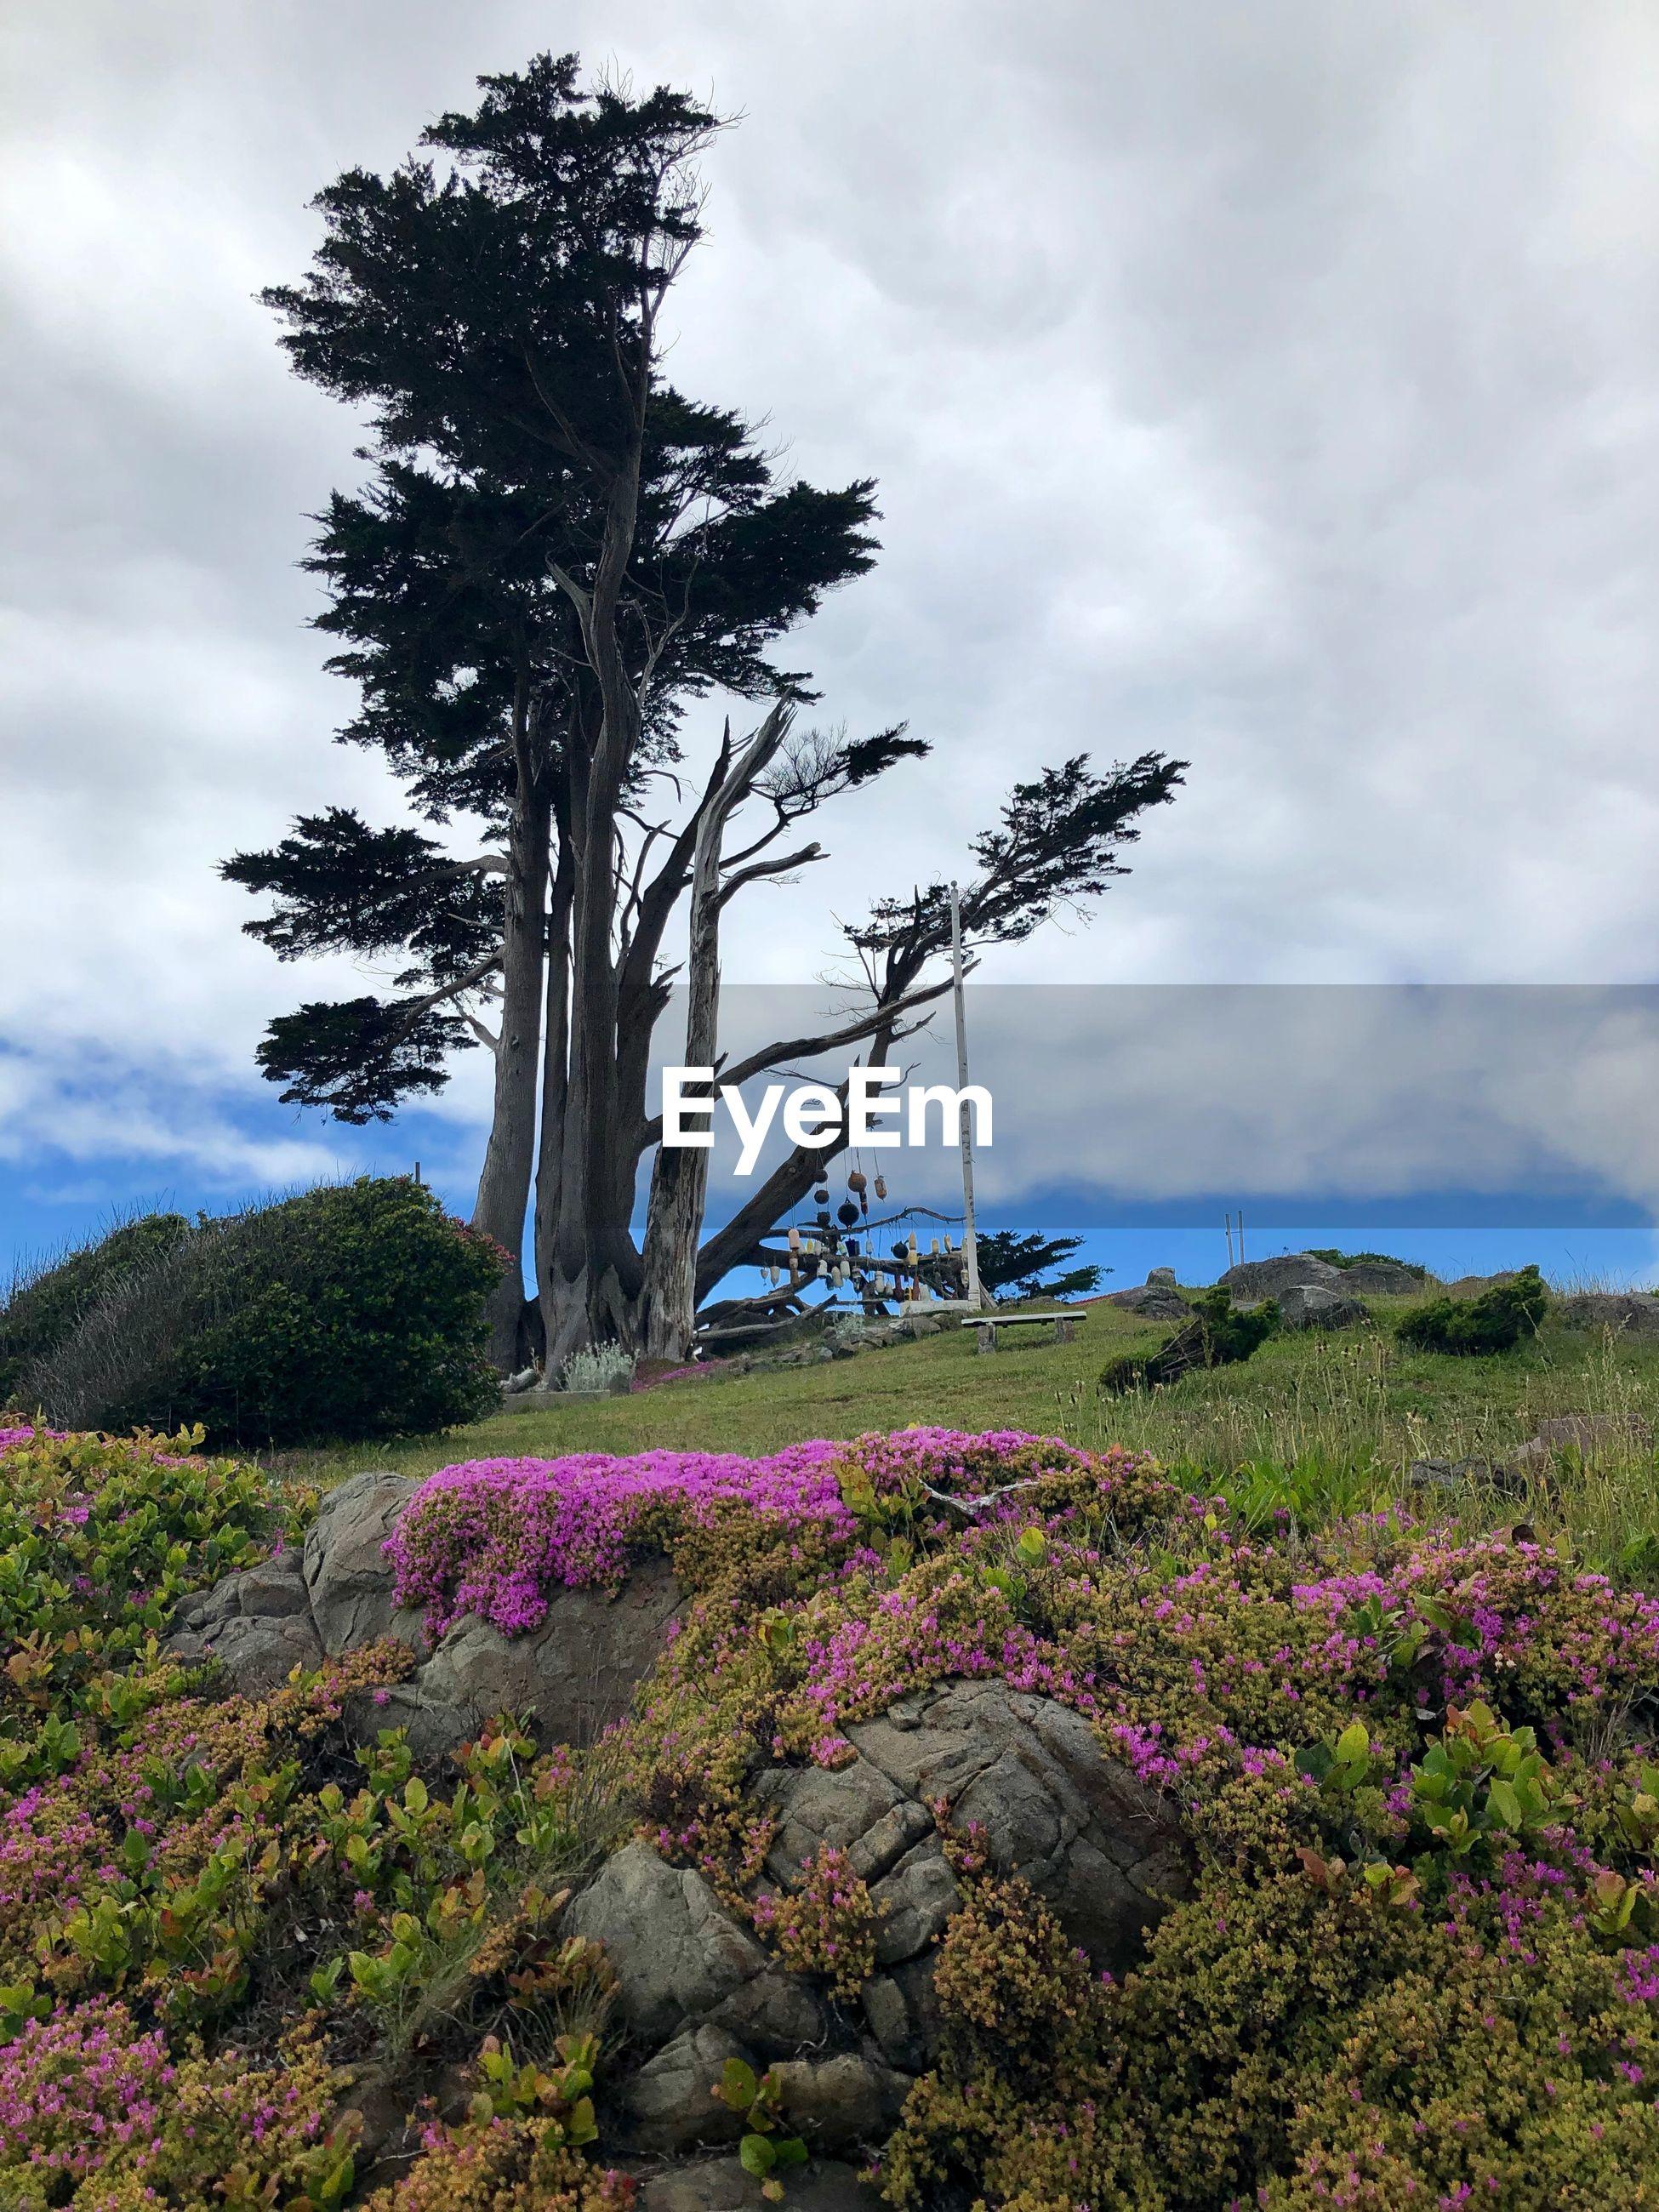 SCENIC VIEW OF PURPLE FLOWERING PLANTS ON FIELD